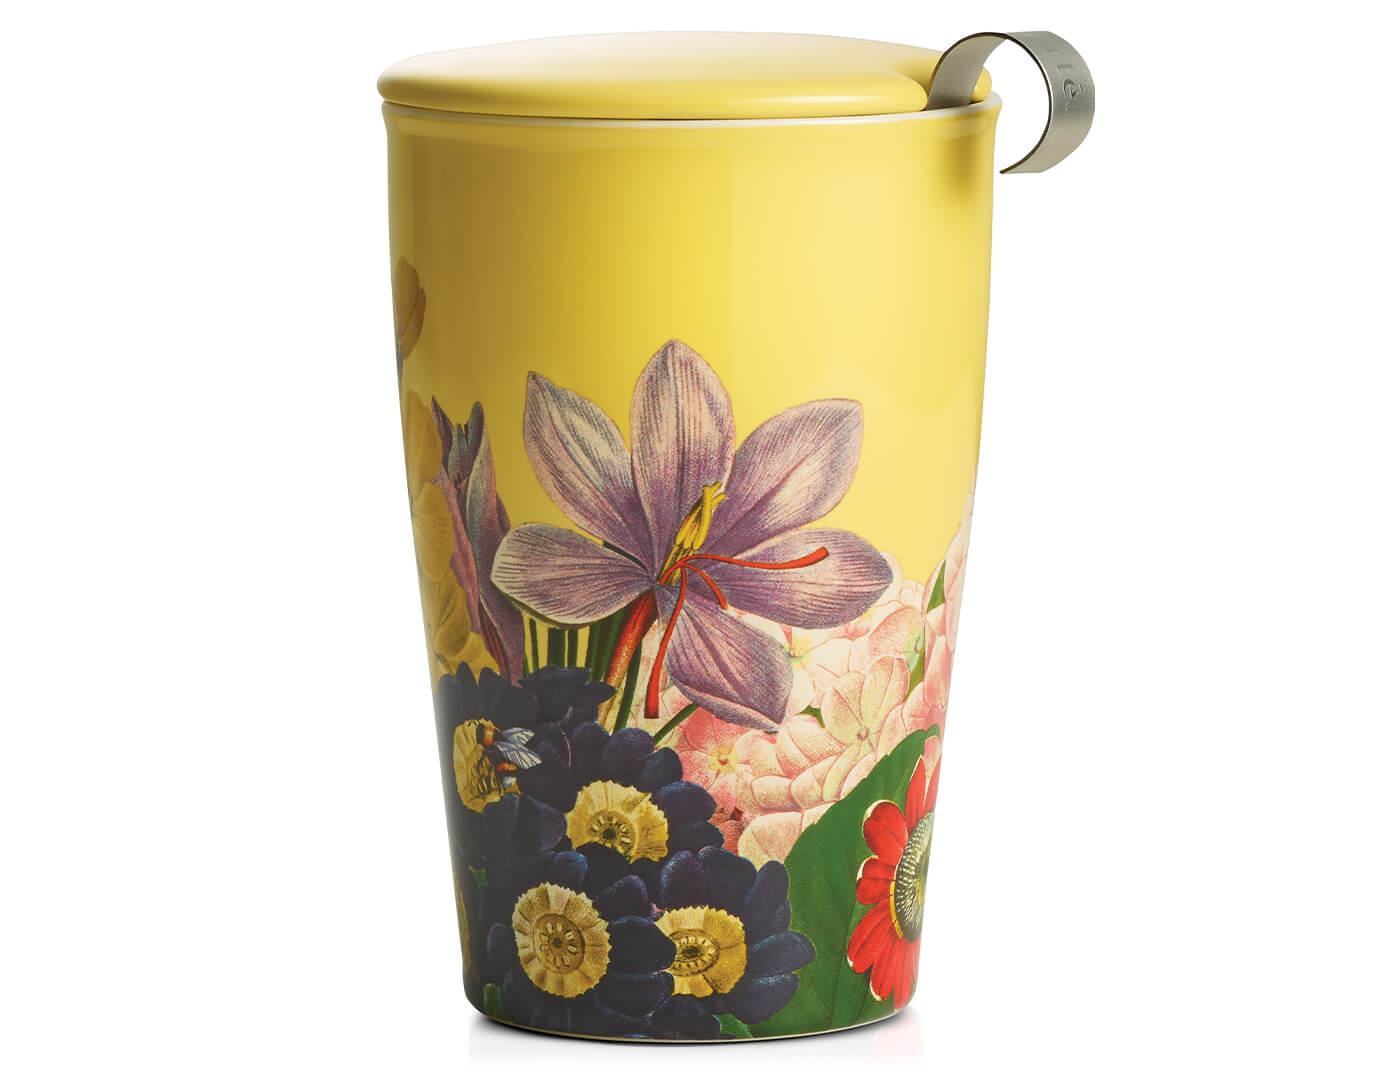 KATI Cup - Soleil